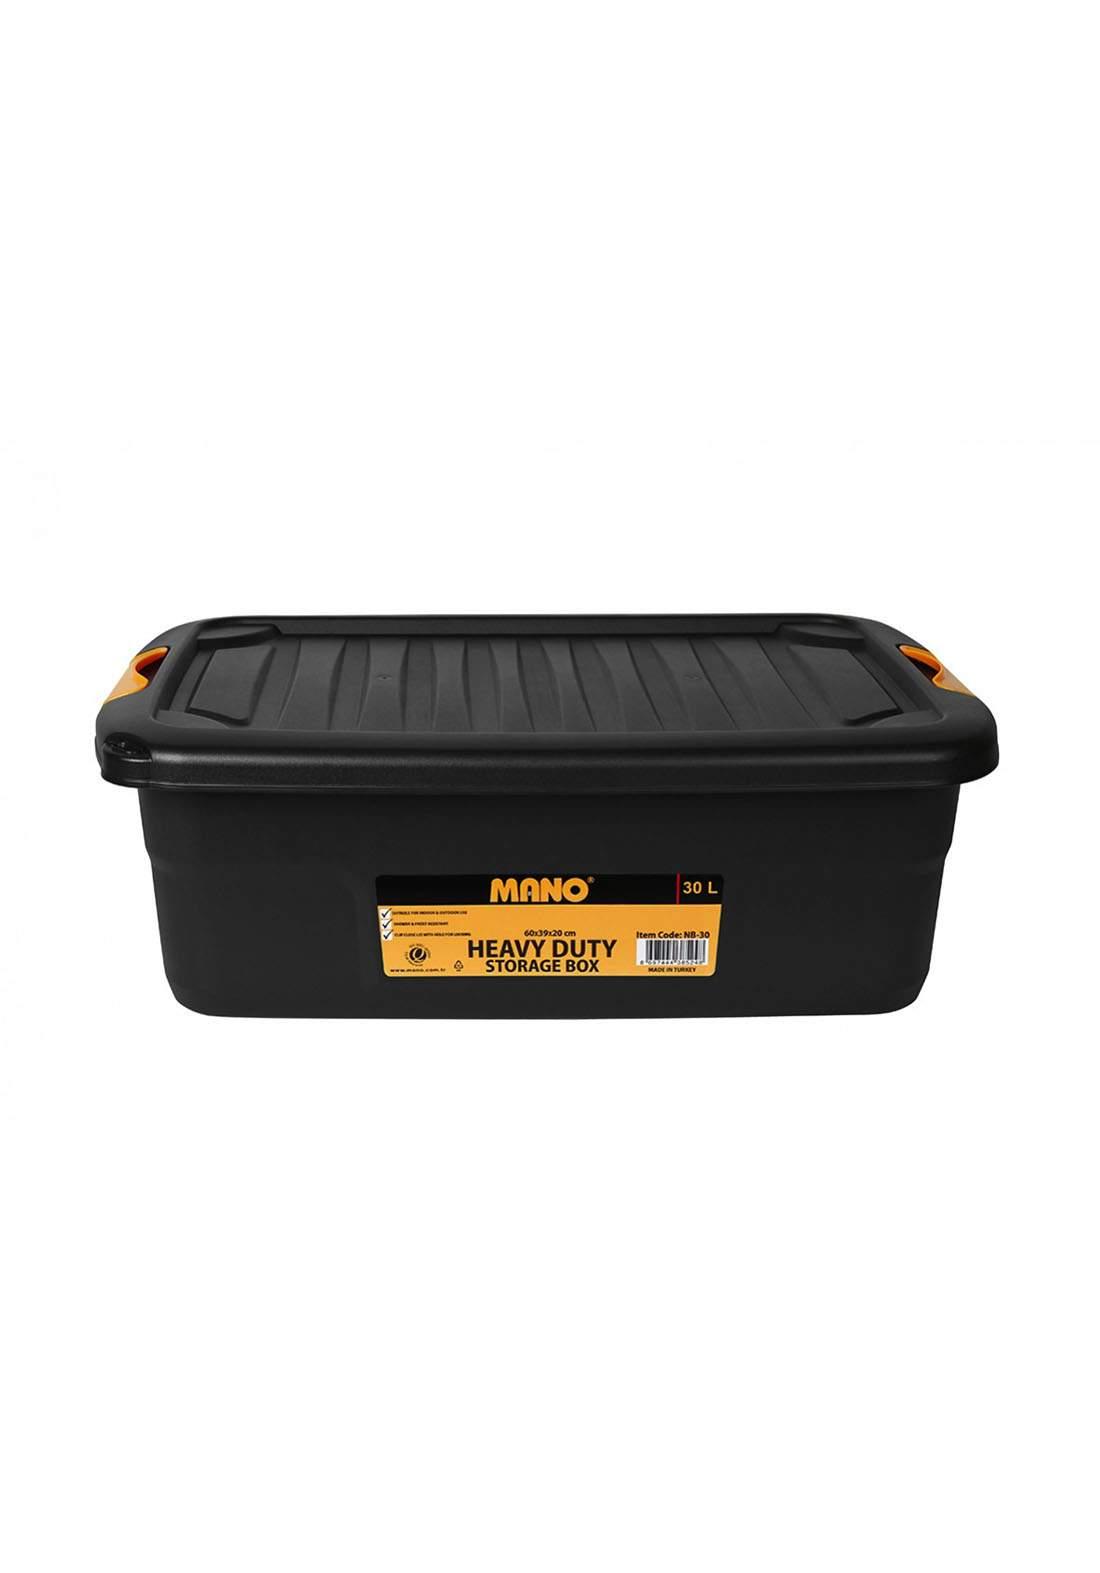 Mano NB-30 Storage Box 30L صندوق تخزين